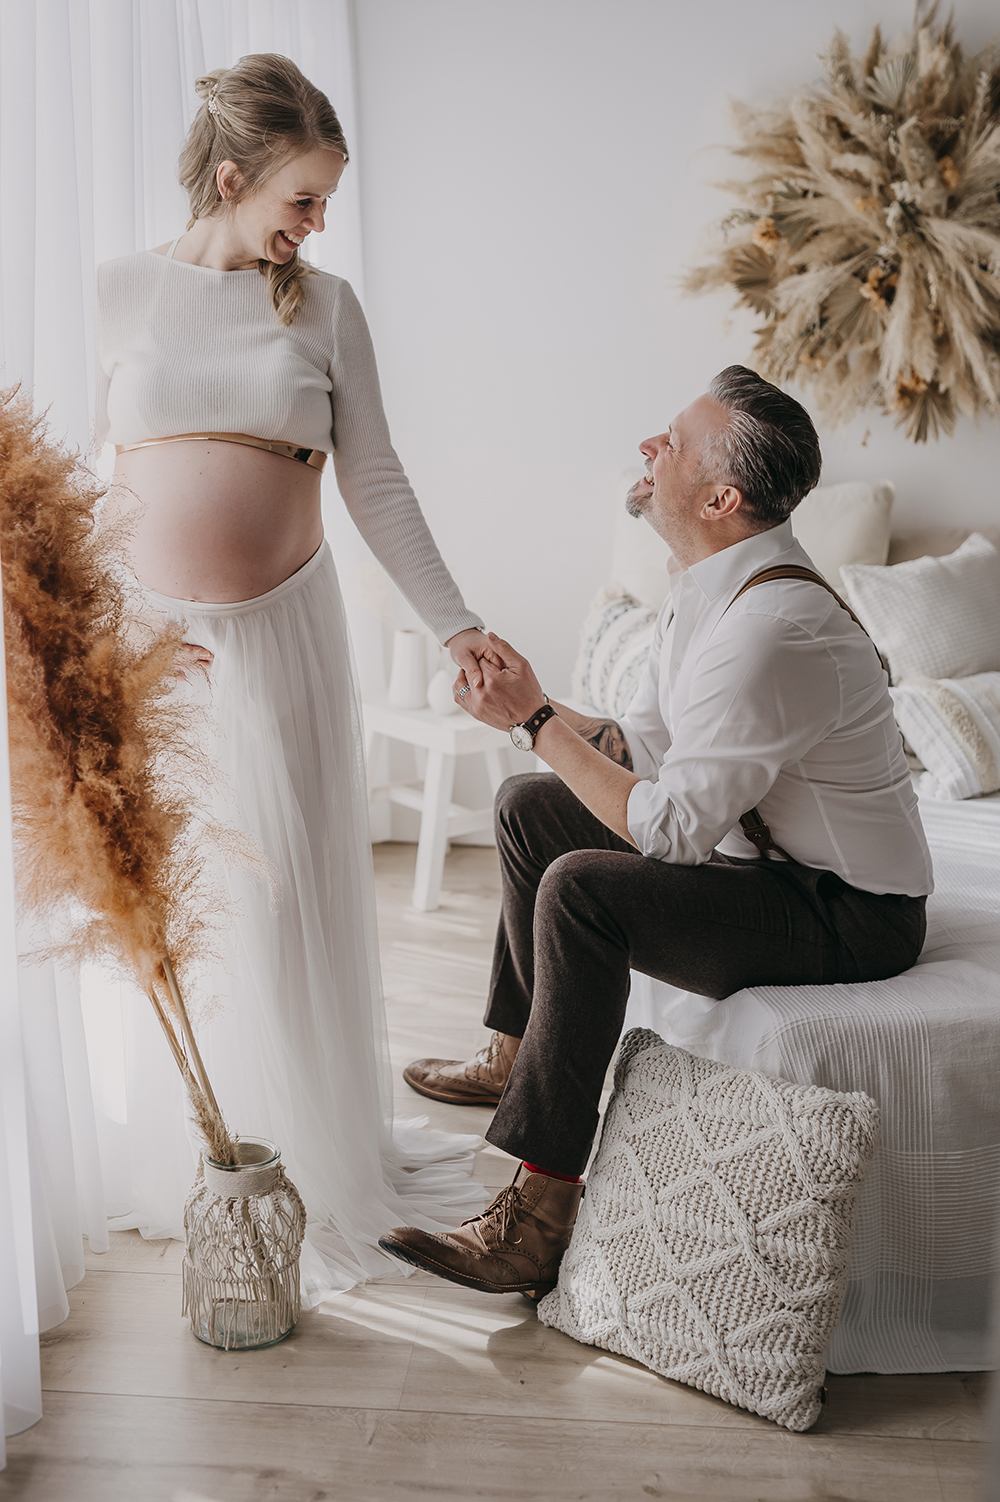 babyfotos limburg montabaur badcamberg koblenz giessen neugeborenenfotografie schwangerschaftsshooting babybauchbilder www.fotografie km.de fotografie katharina mueller